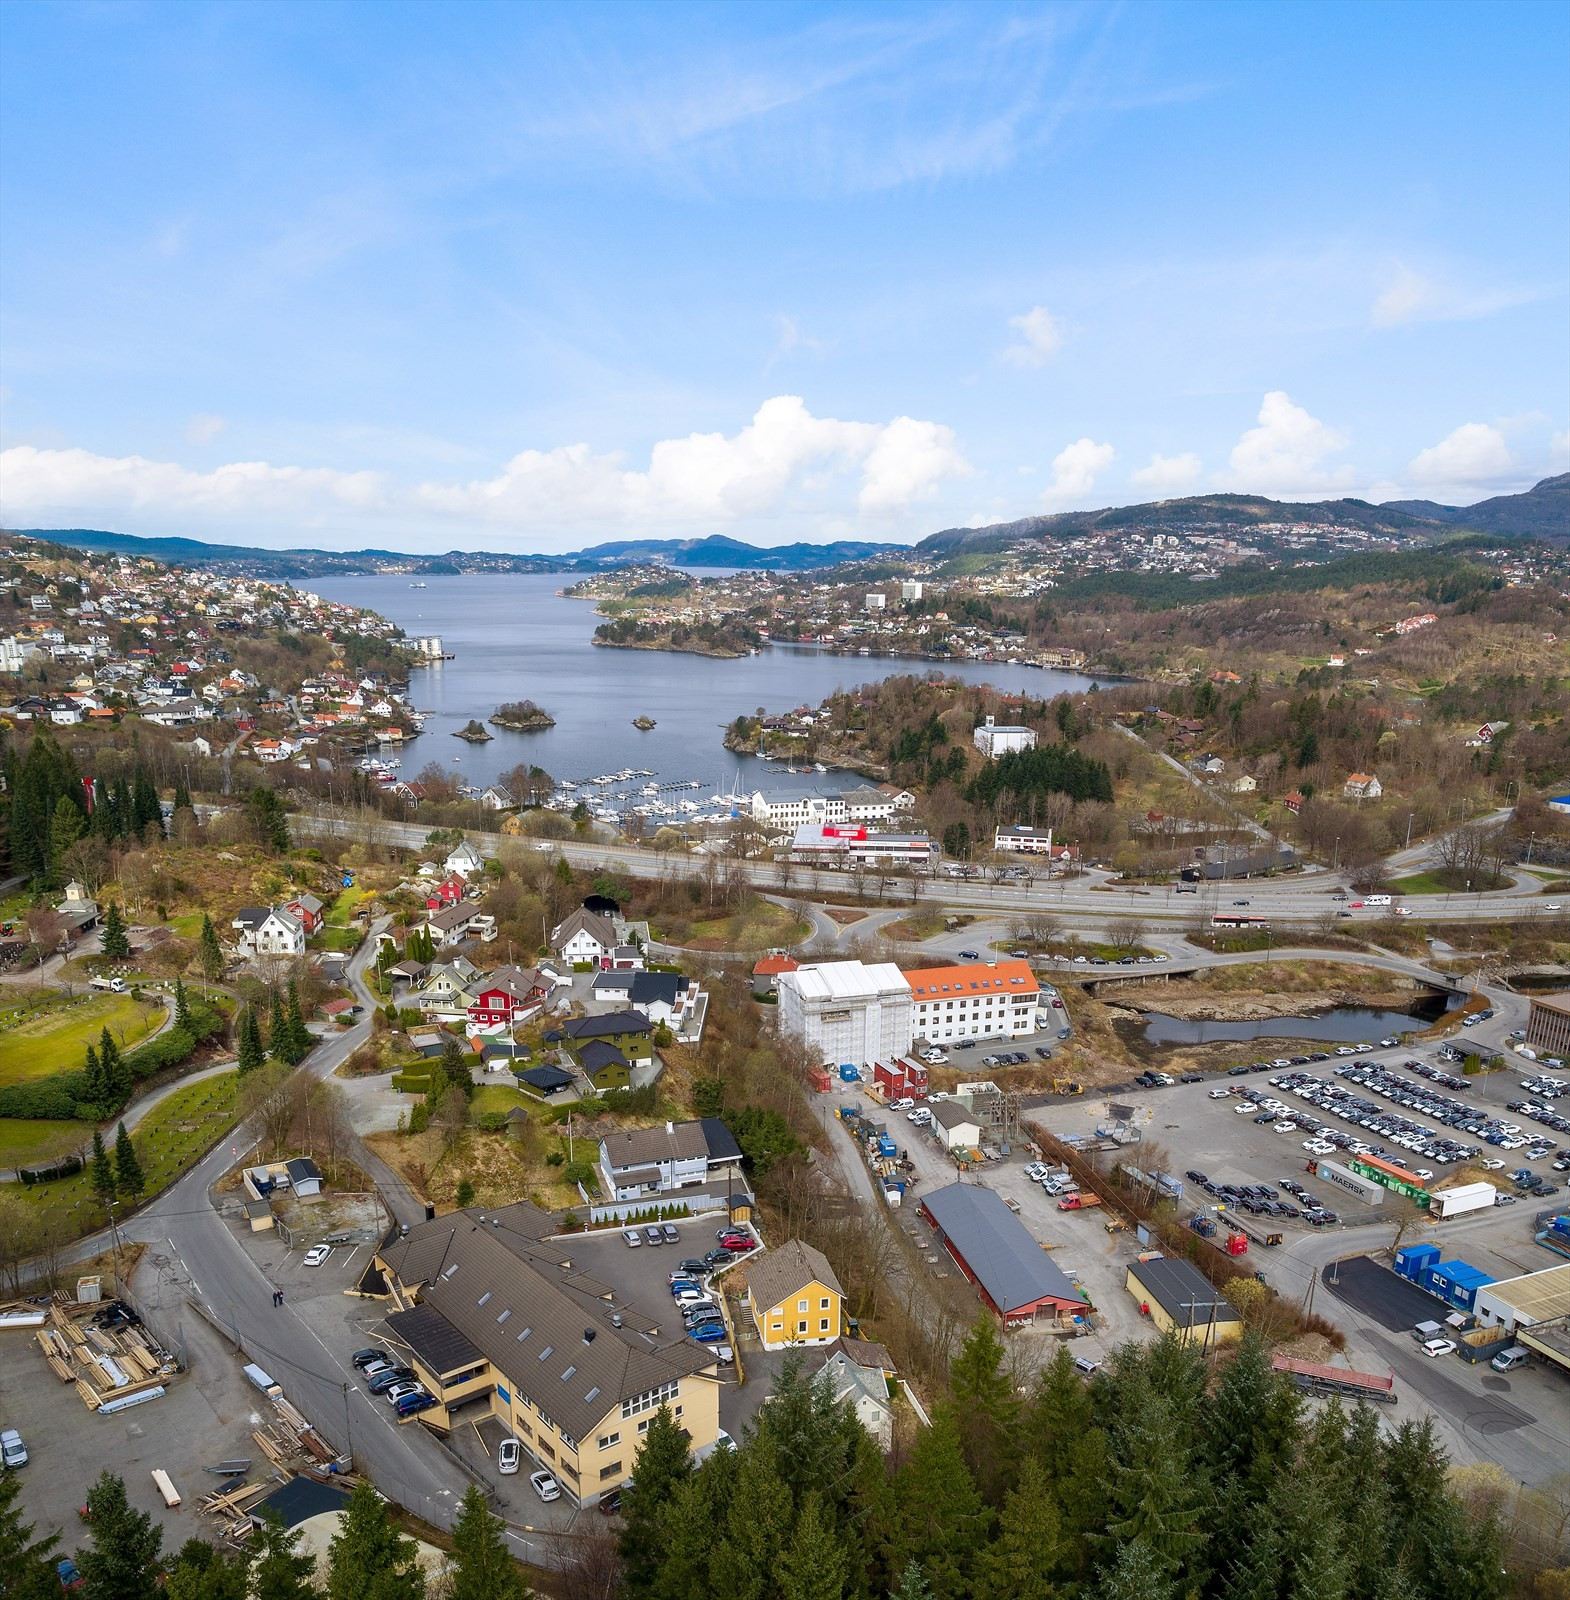 Meget egnet plassering mellom Åsane og Bergen sentrum. Også enkel adkomst fra søndre bydel.